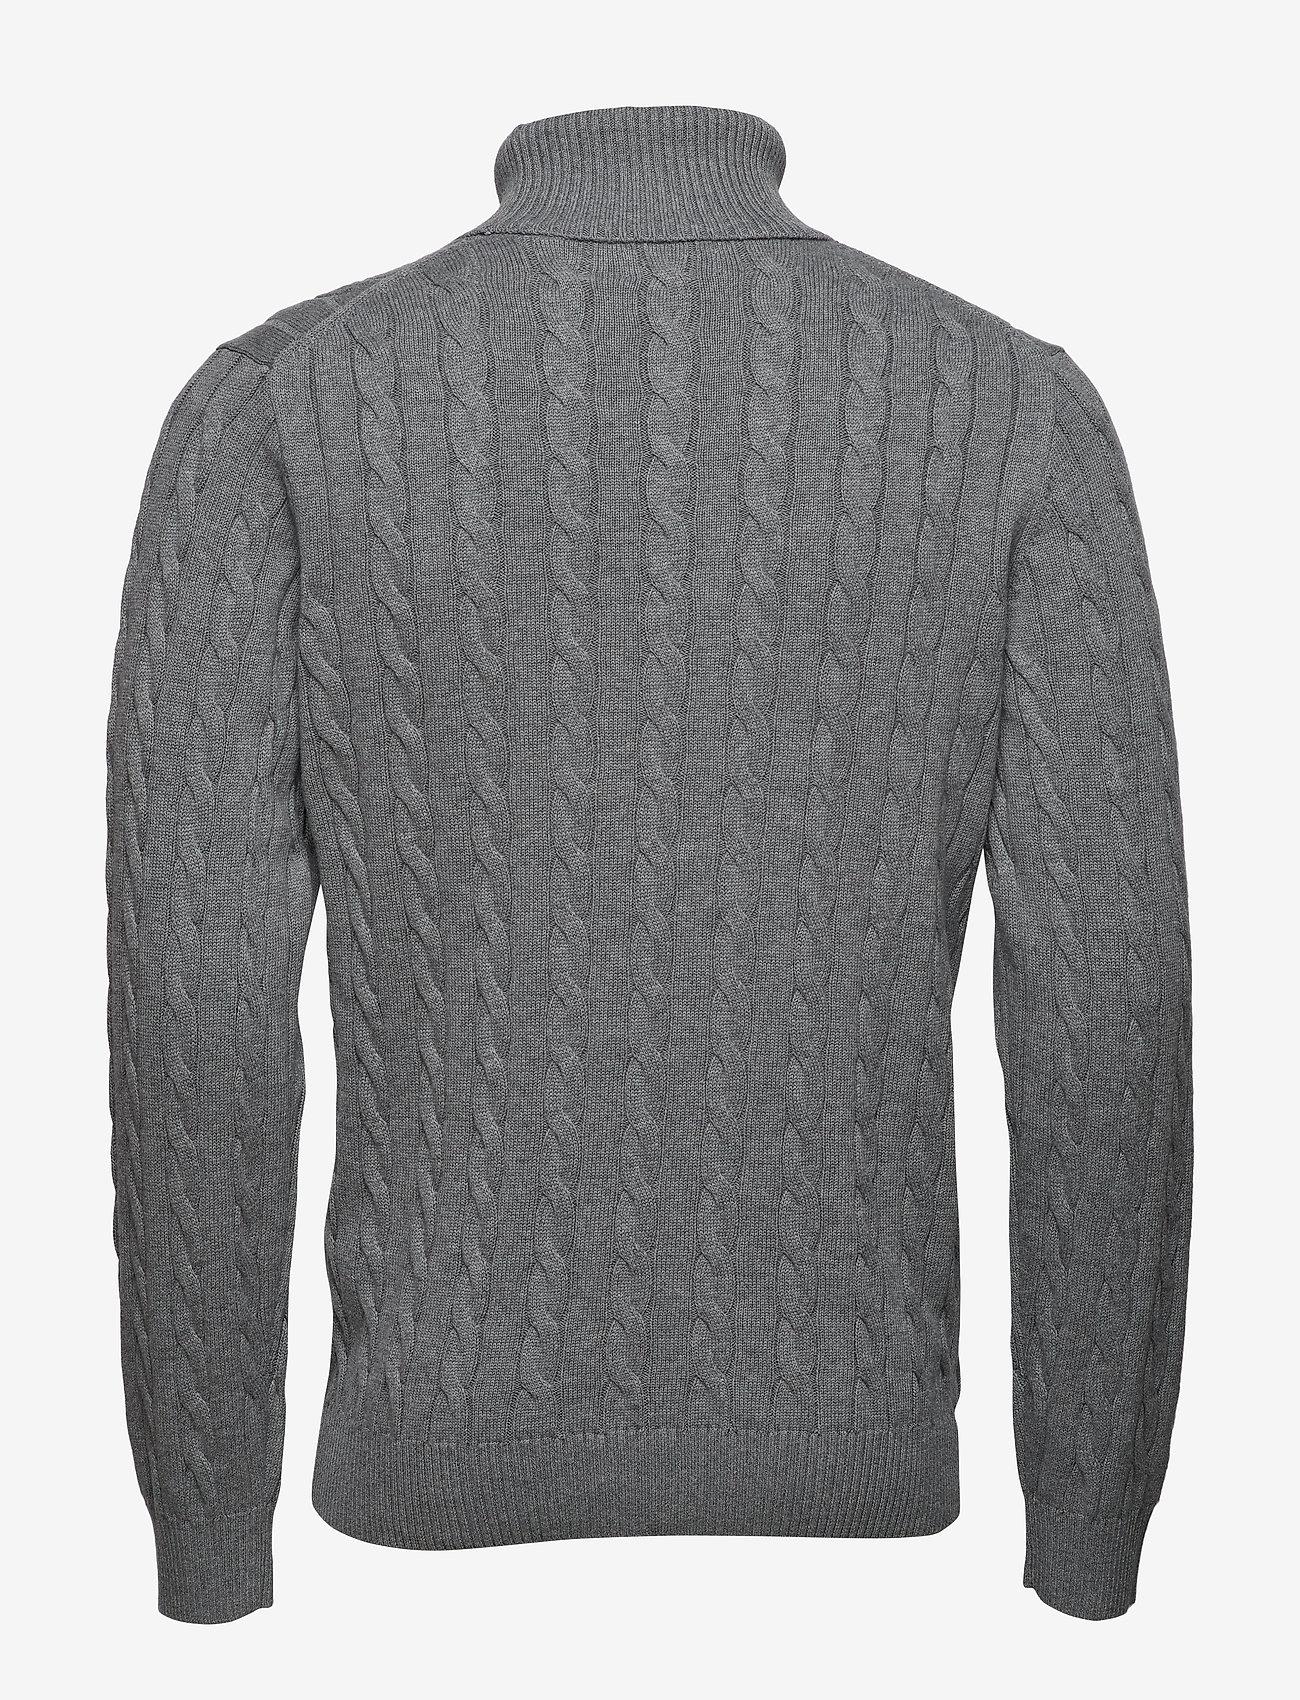 Gant - COTTON CABLE TURTLE NECK - poolokaulus - dark grey melange